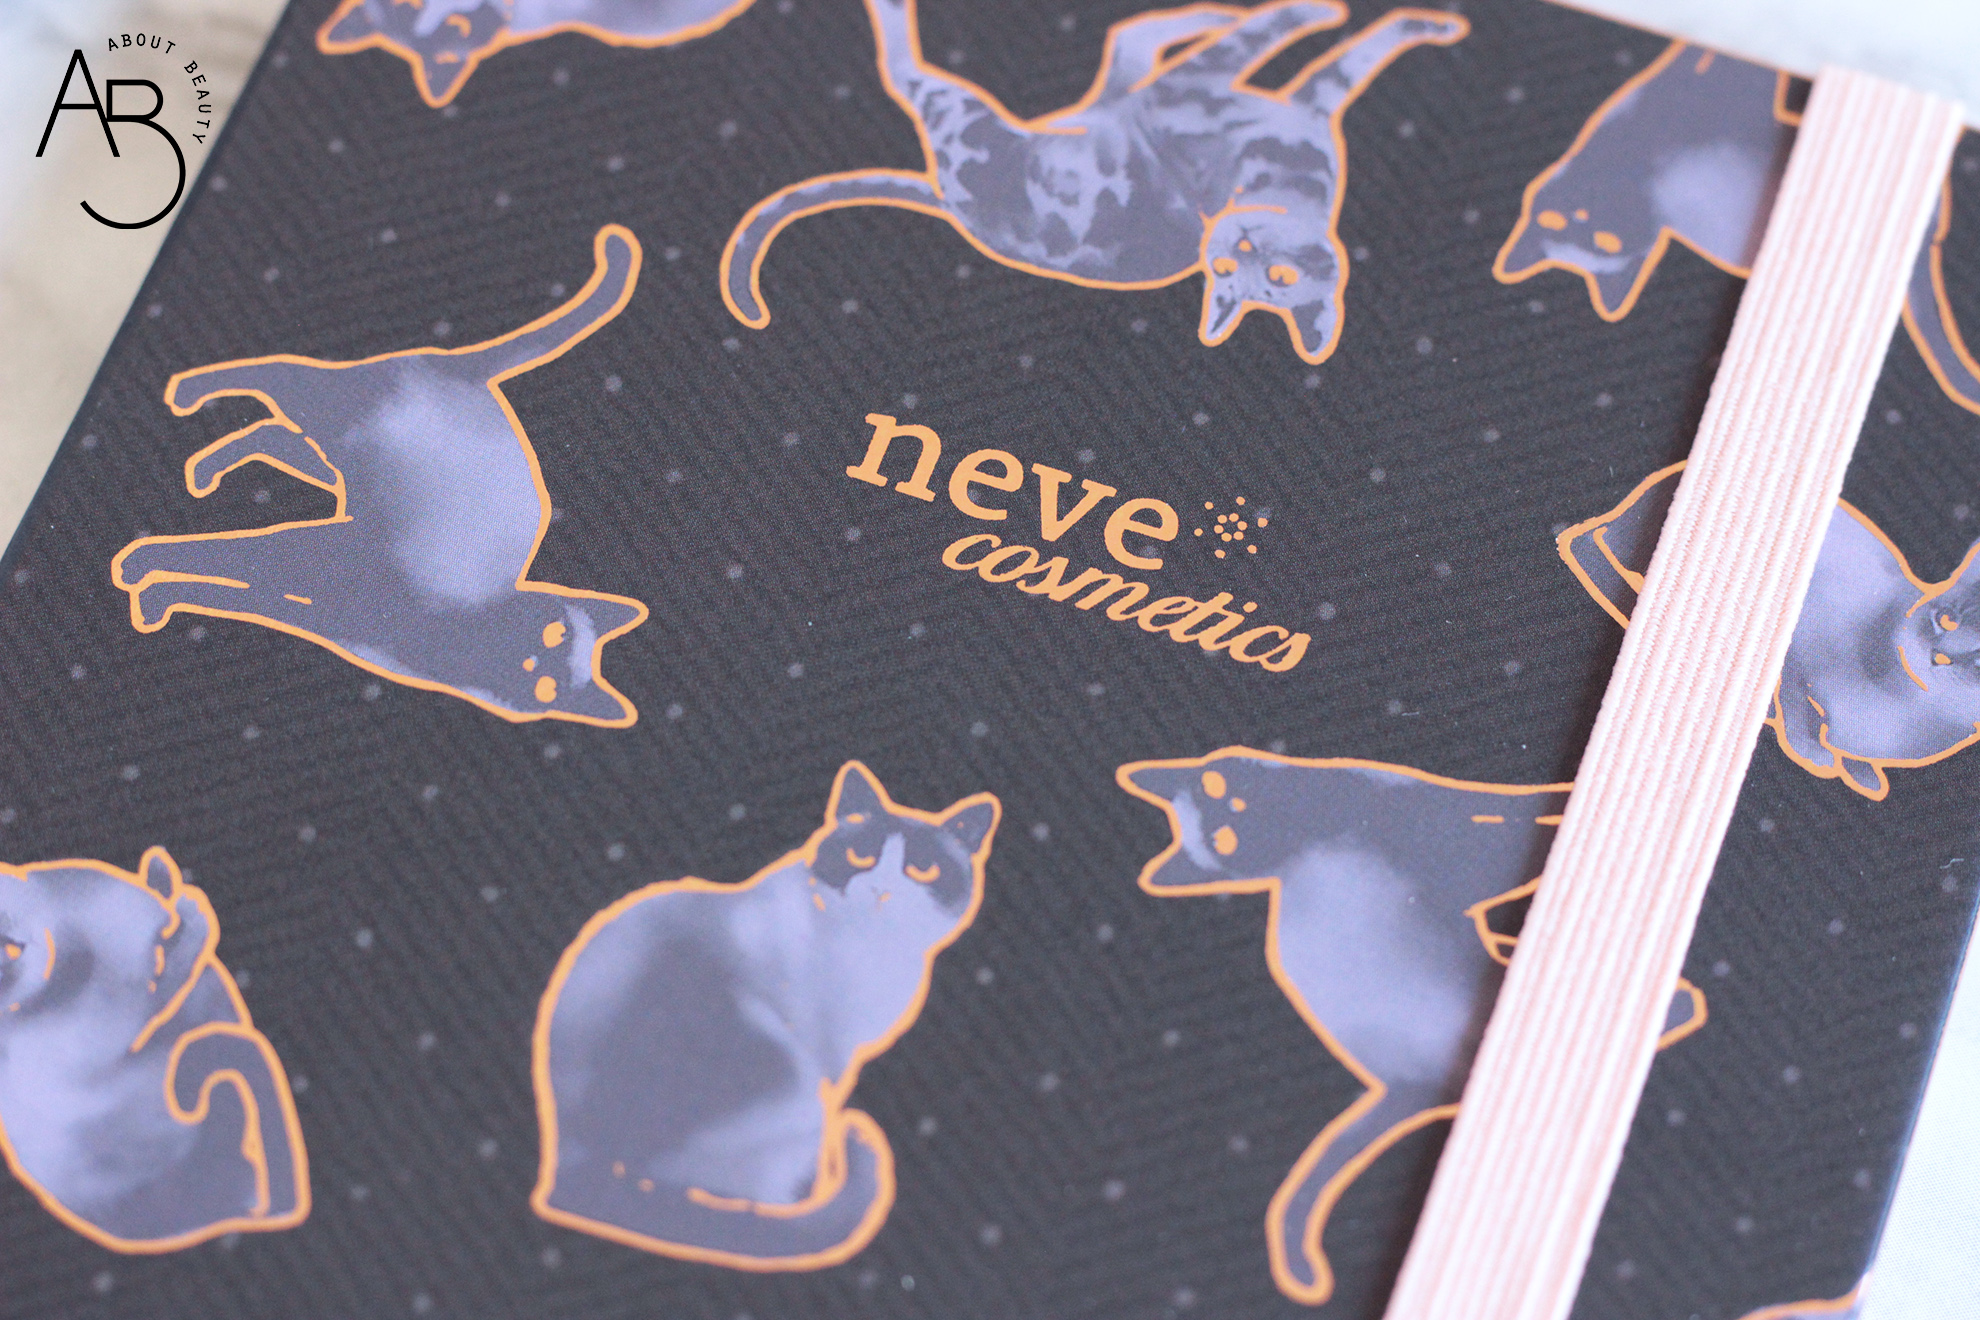 Neve Cosmetics Feline Dreams Palette ombretti - recensione info swatch prezzo codice sconto - about beauty packaging